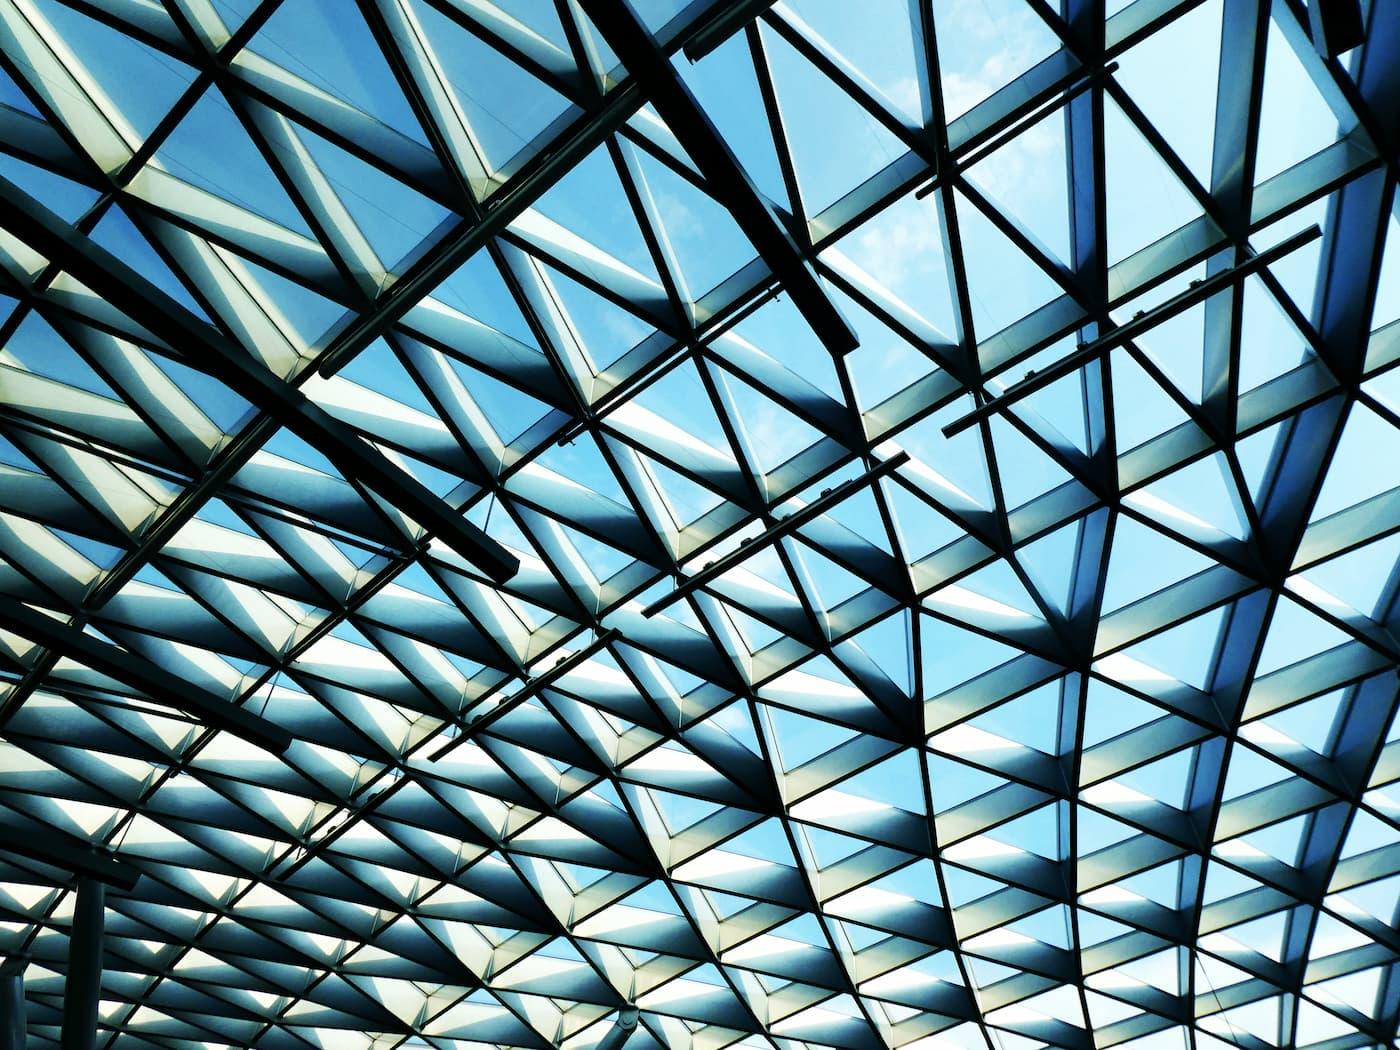 A large, geometric skylight.